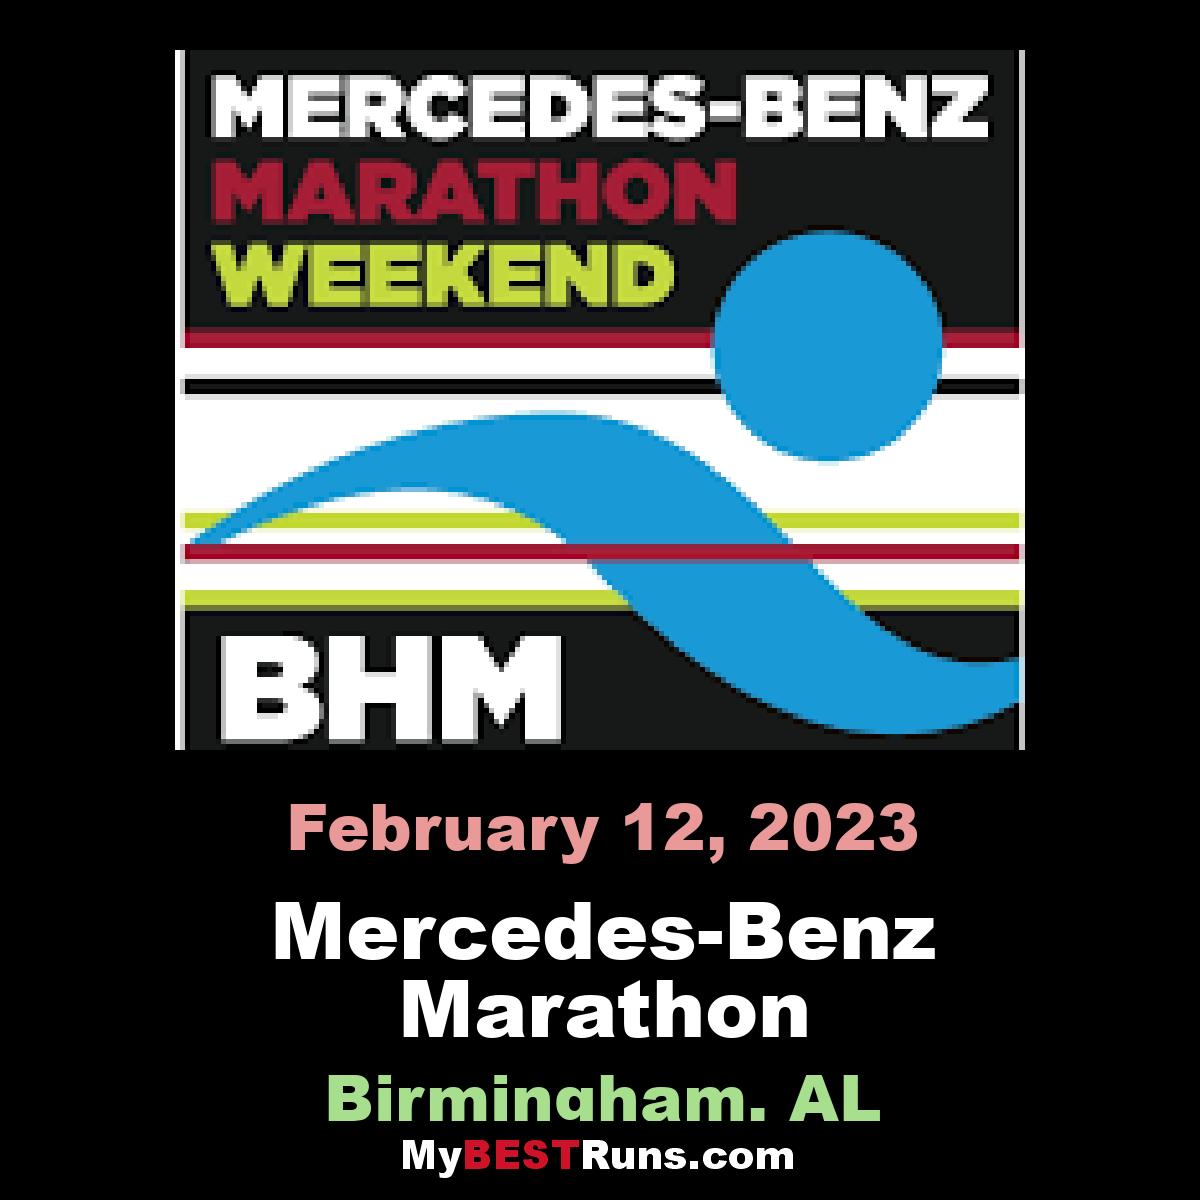 Mercedes-Benz Marathon